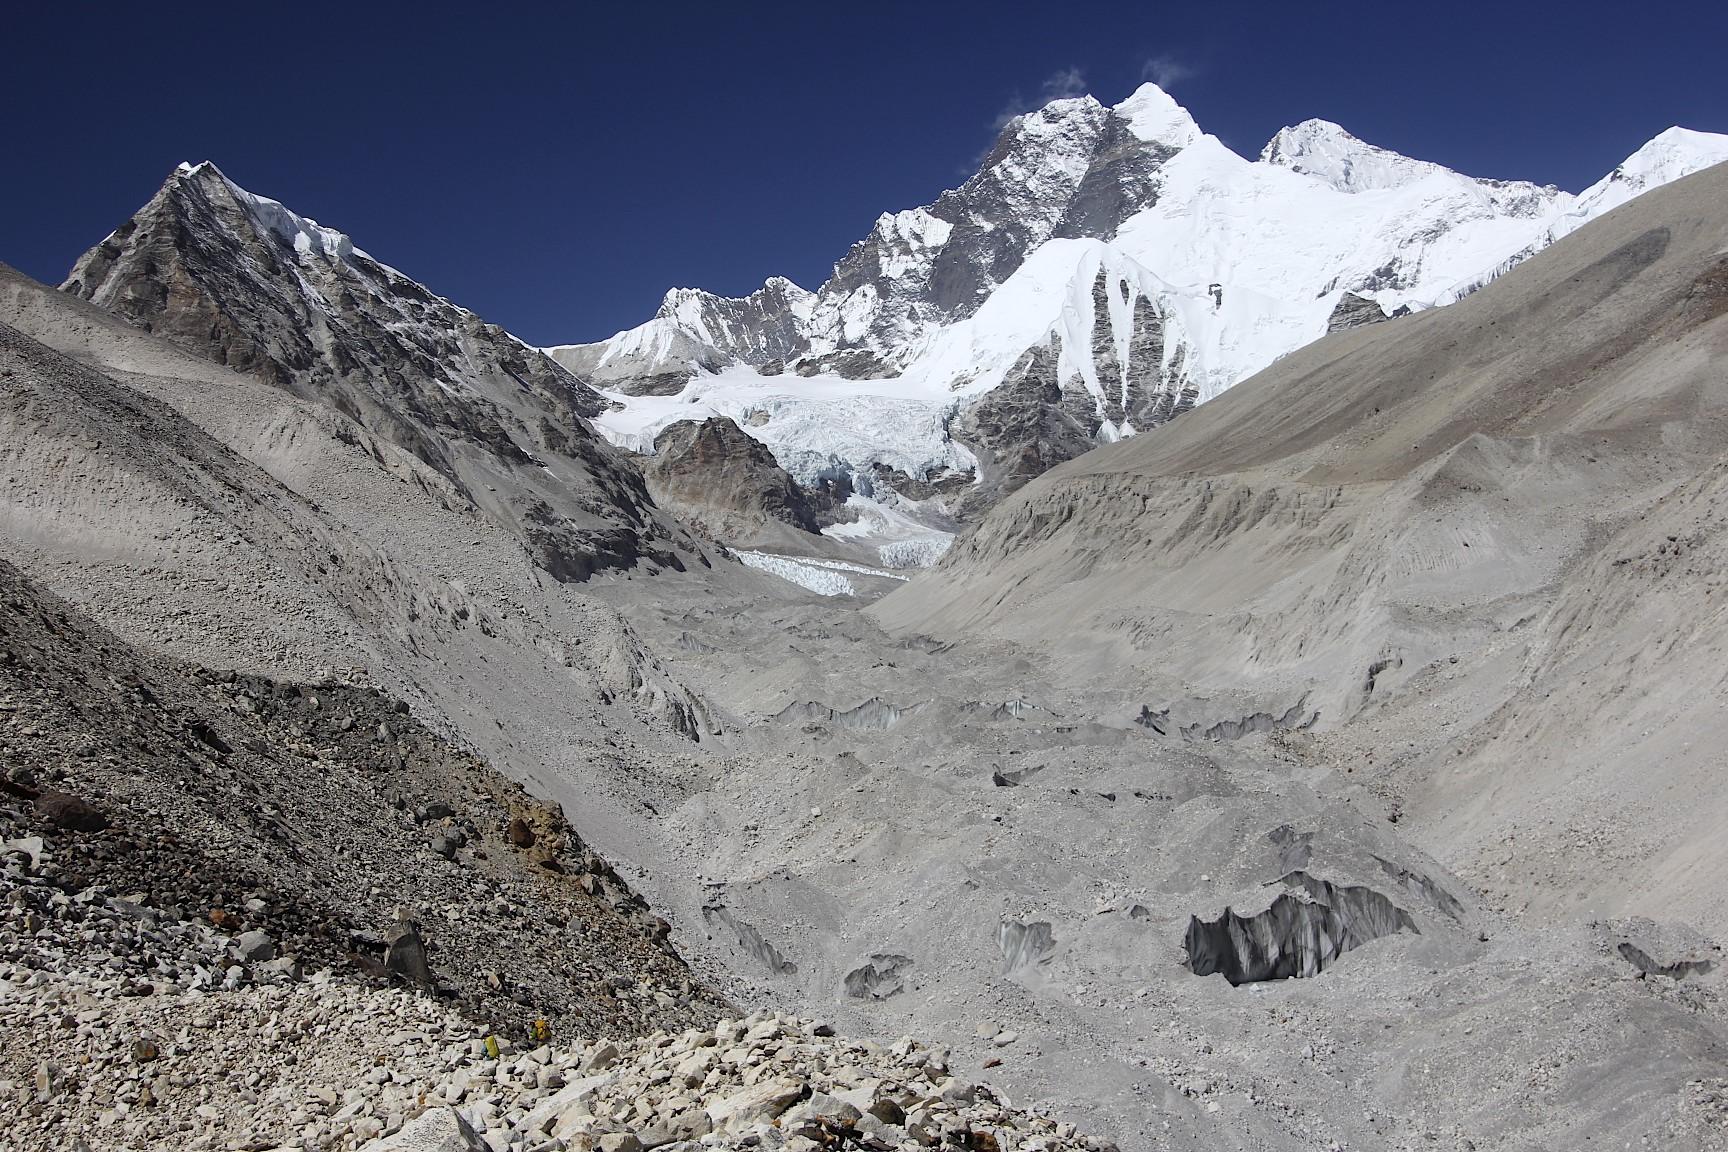 Lhotse, Everest and Barun Glacier